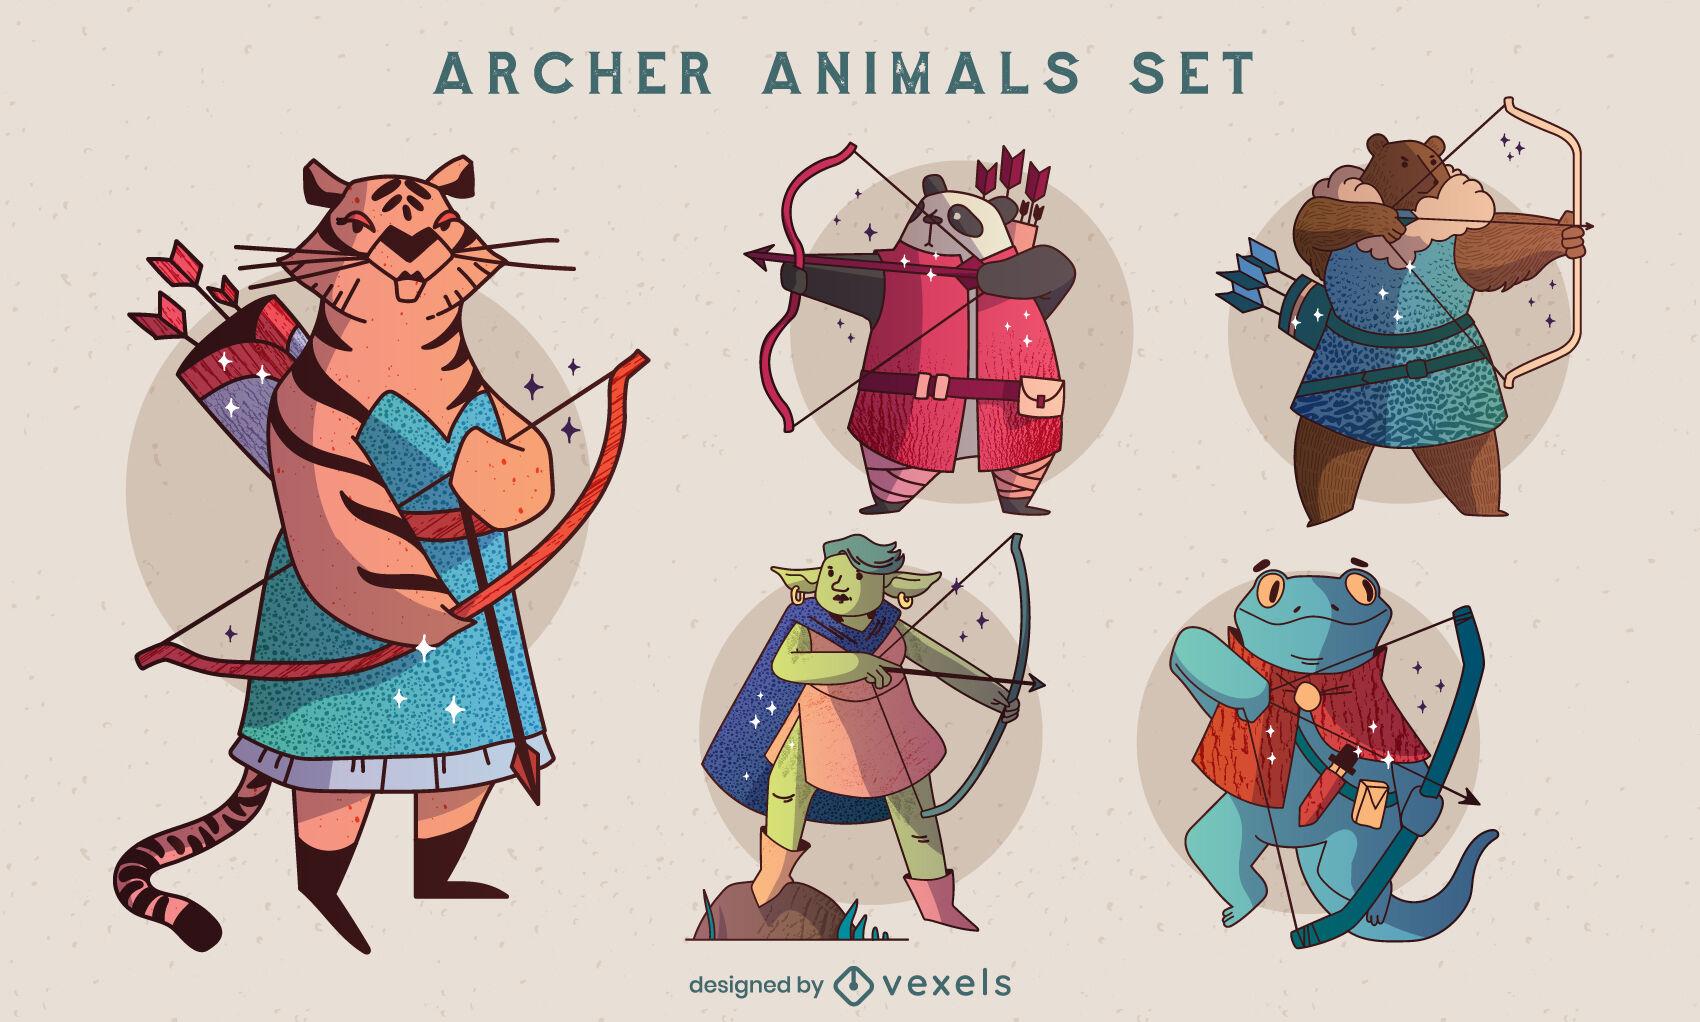 Archery animal characters illustration set